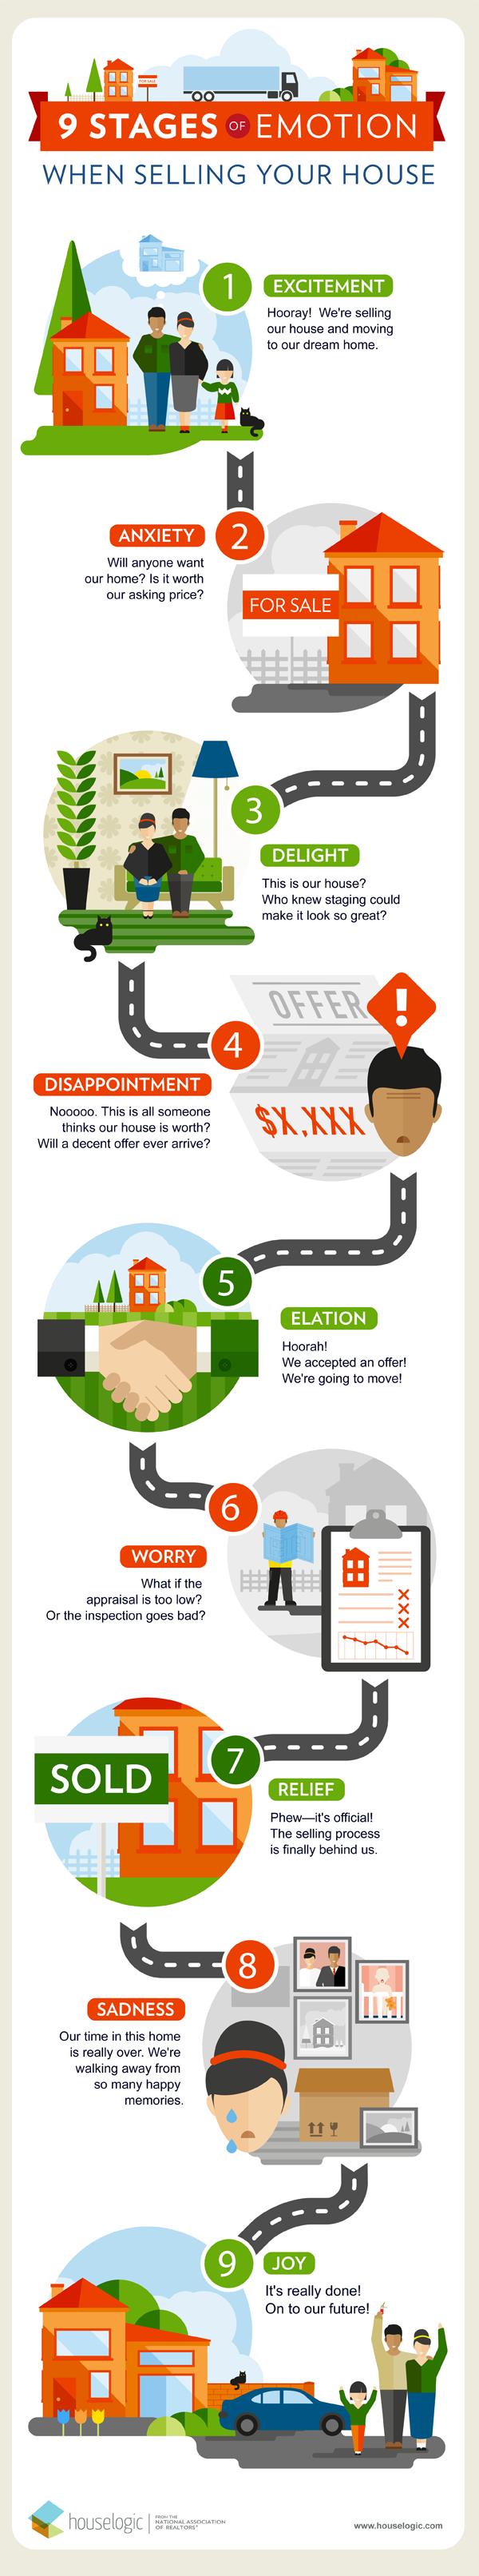 selling-house-infographic_36dd0bebeb13e19bd4e99c1fa49985c5